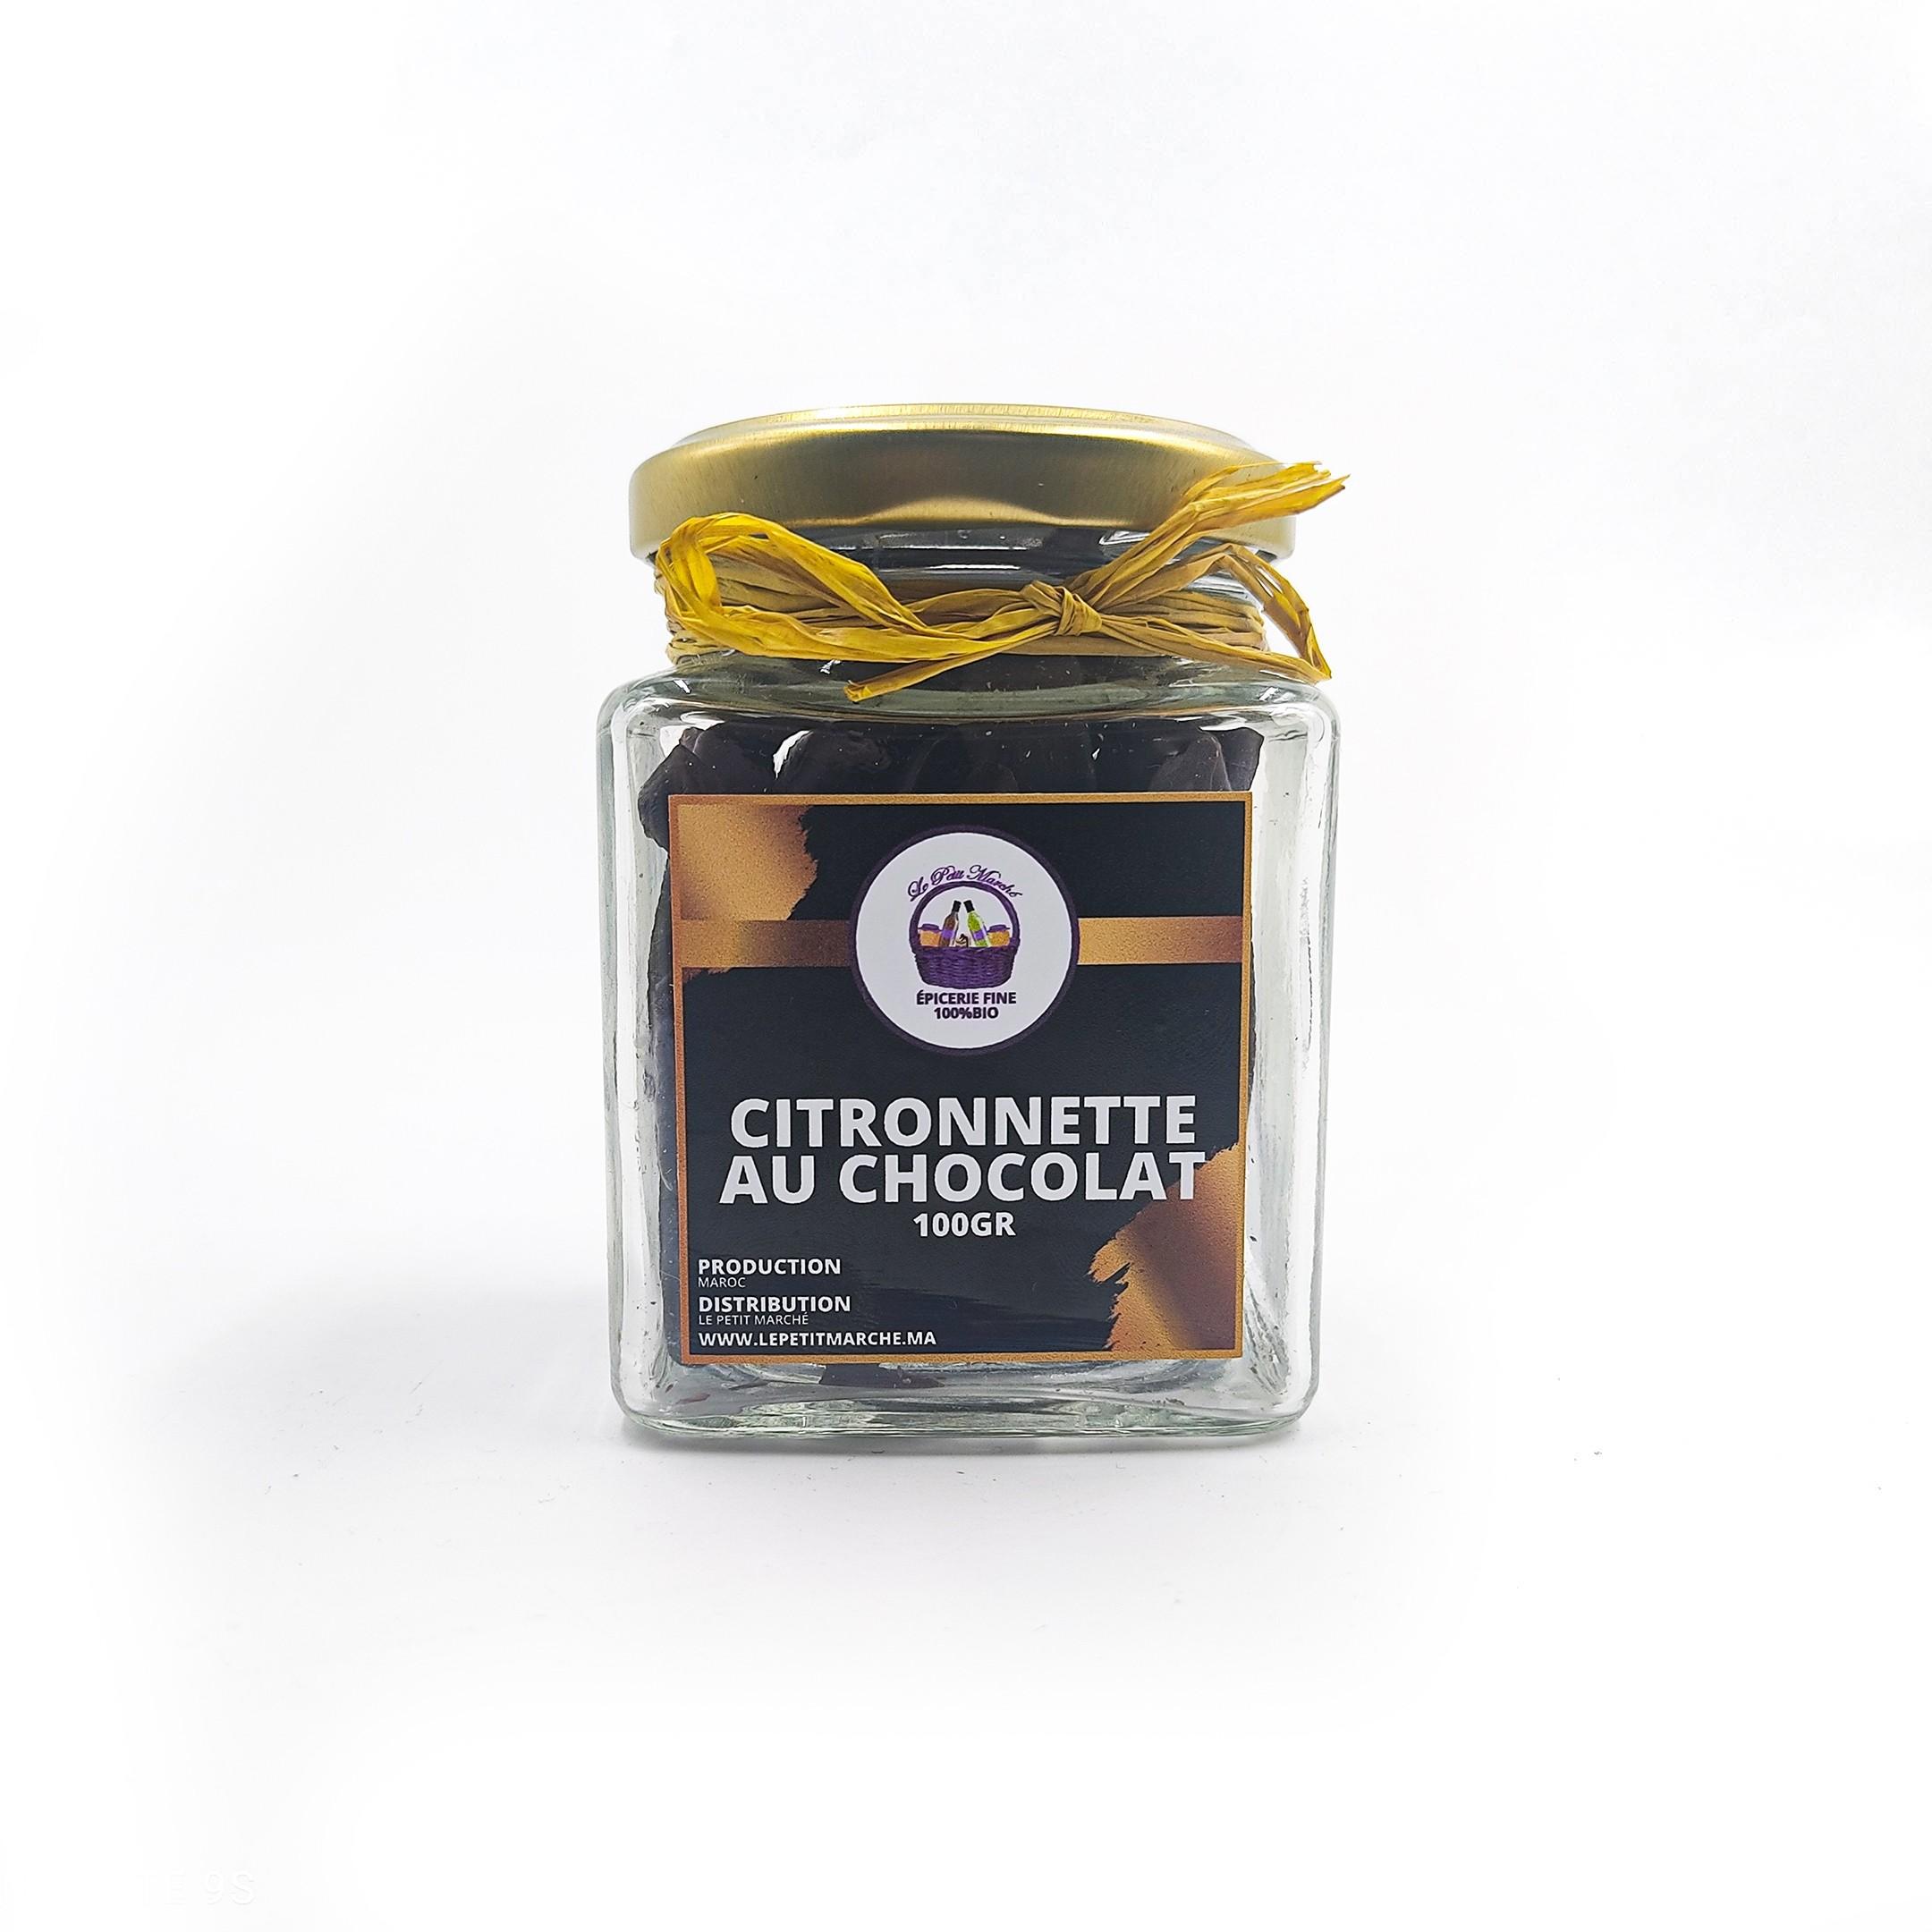 Citronette au chocolat 100 g